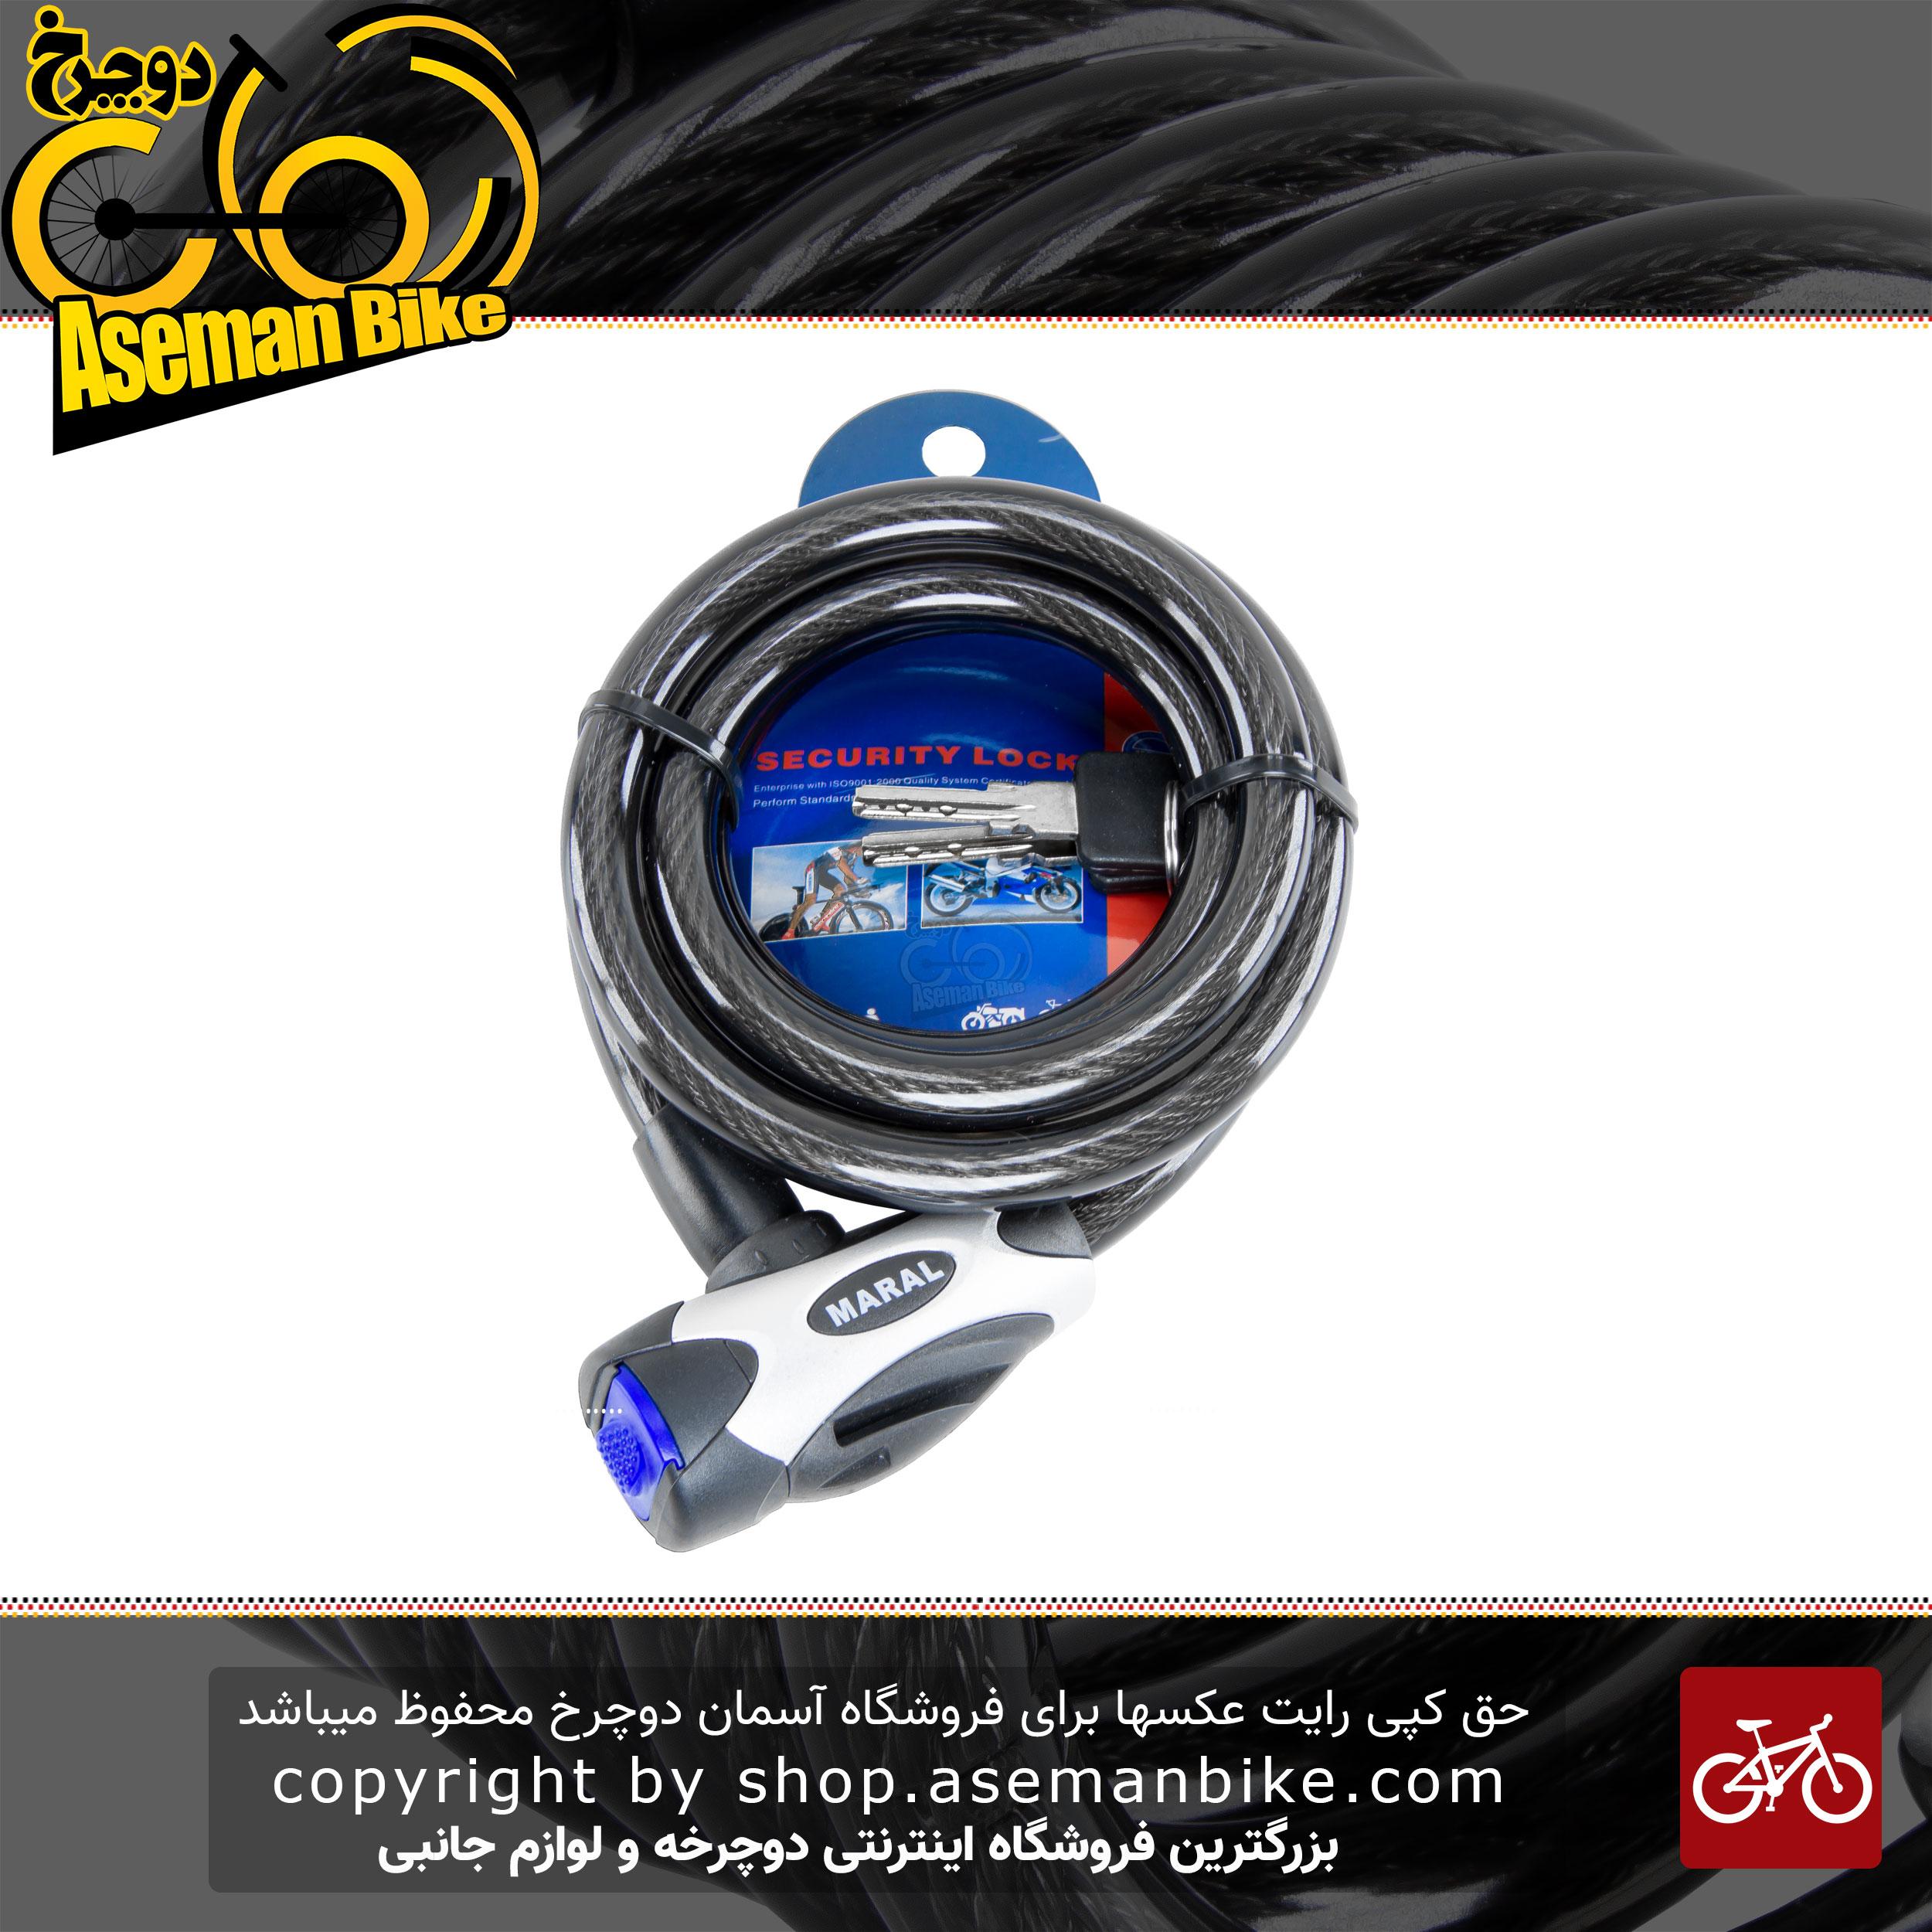 قفل ایمنی دوچرخه مارال 555 12x1500 کلید کامپیوتری SECURITY LOCK CABLE 12X1500 MARAL Black